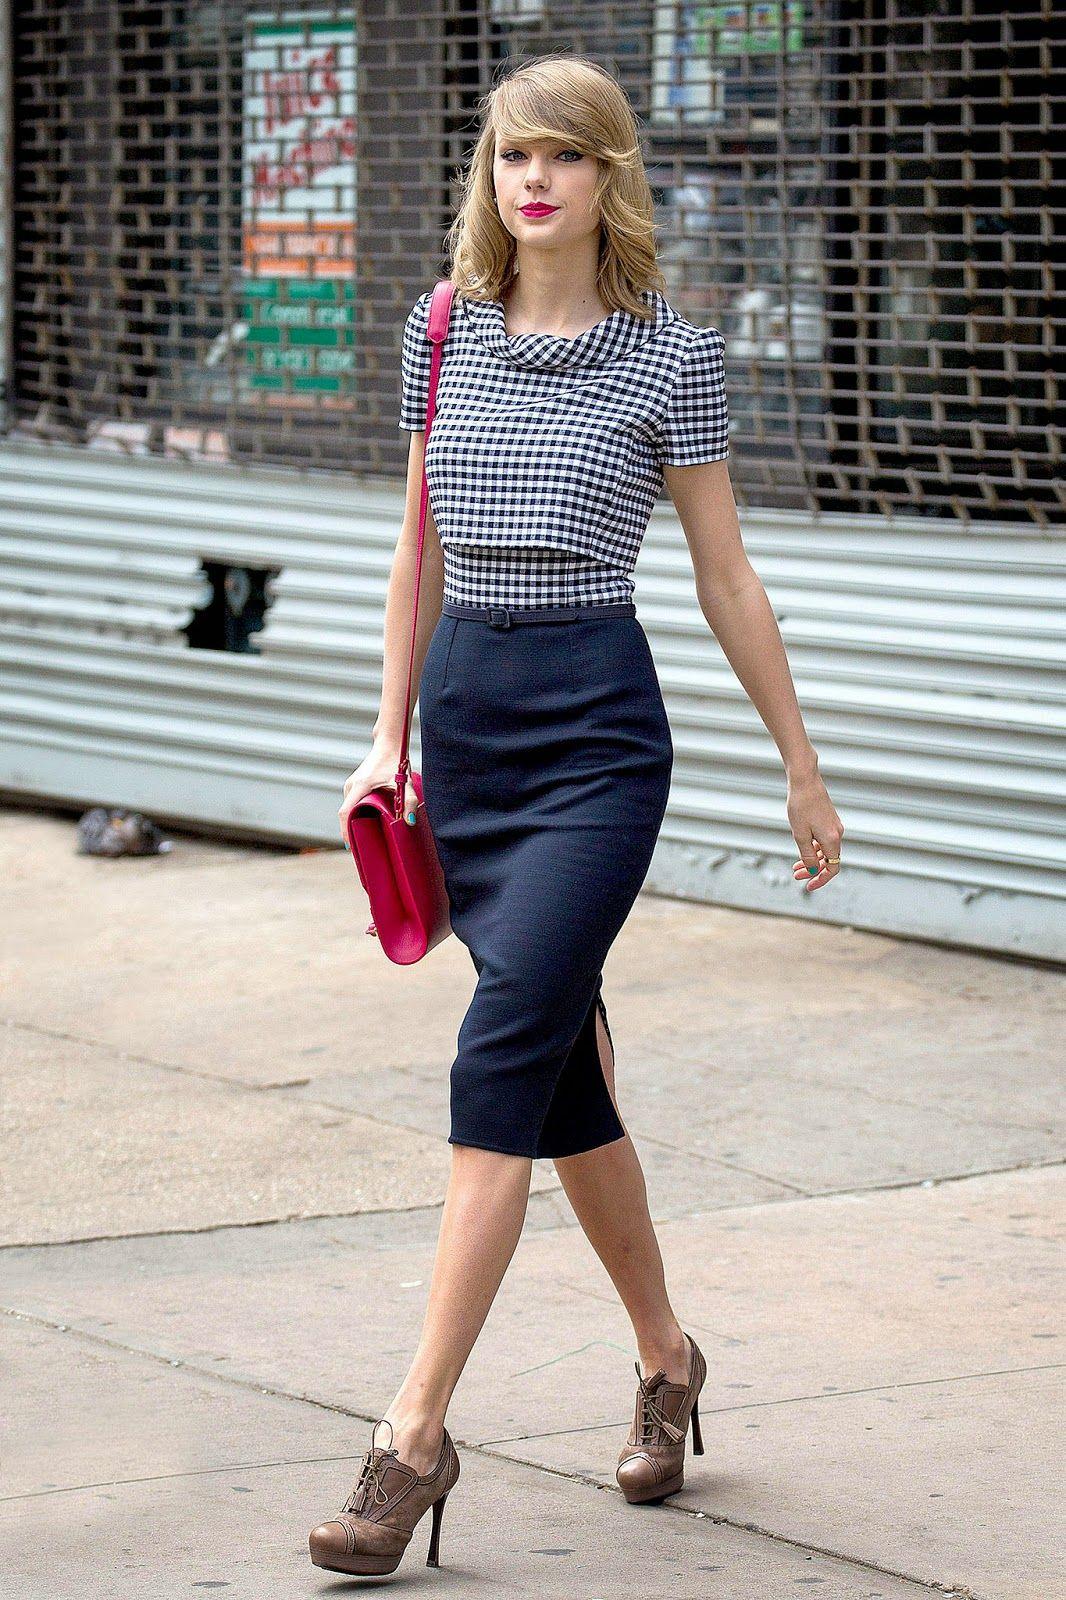 to wear - Retro Swift fashion video